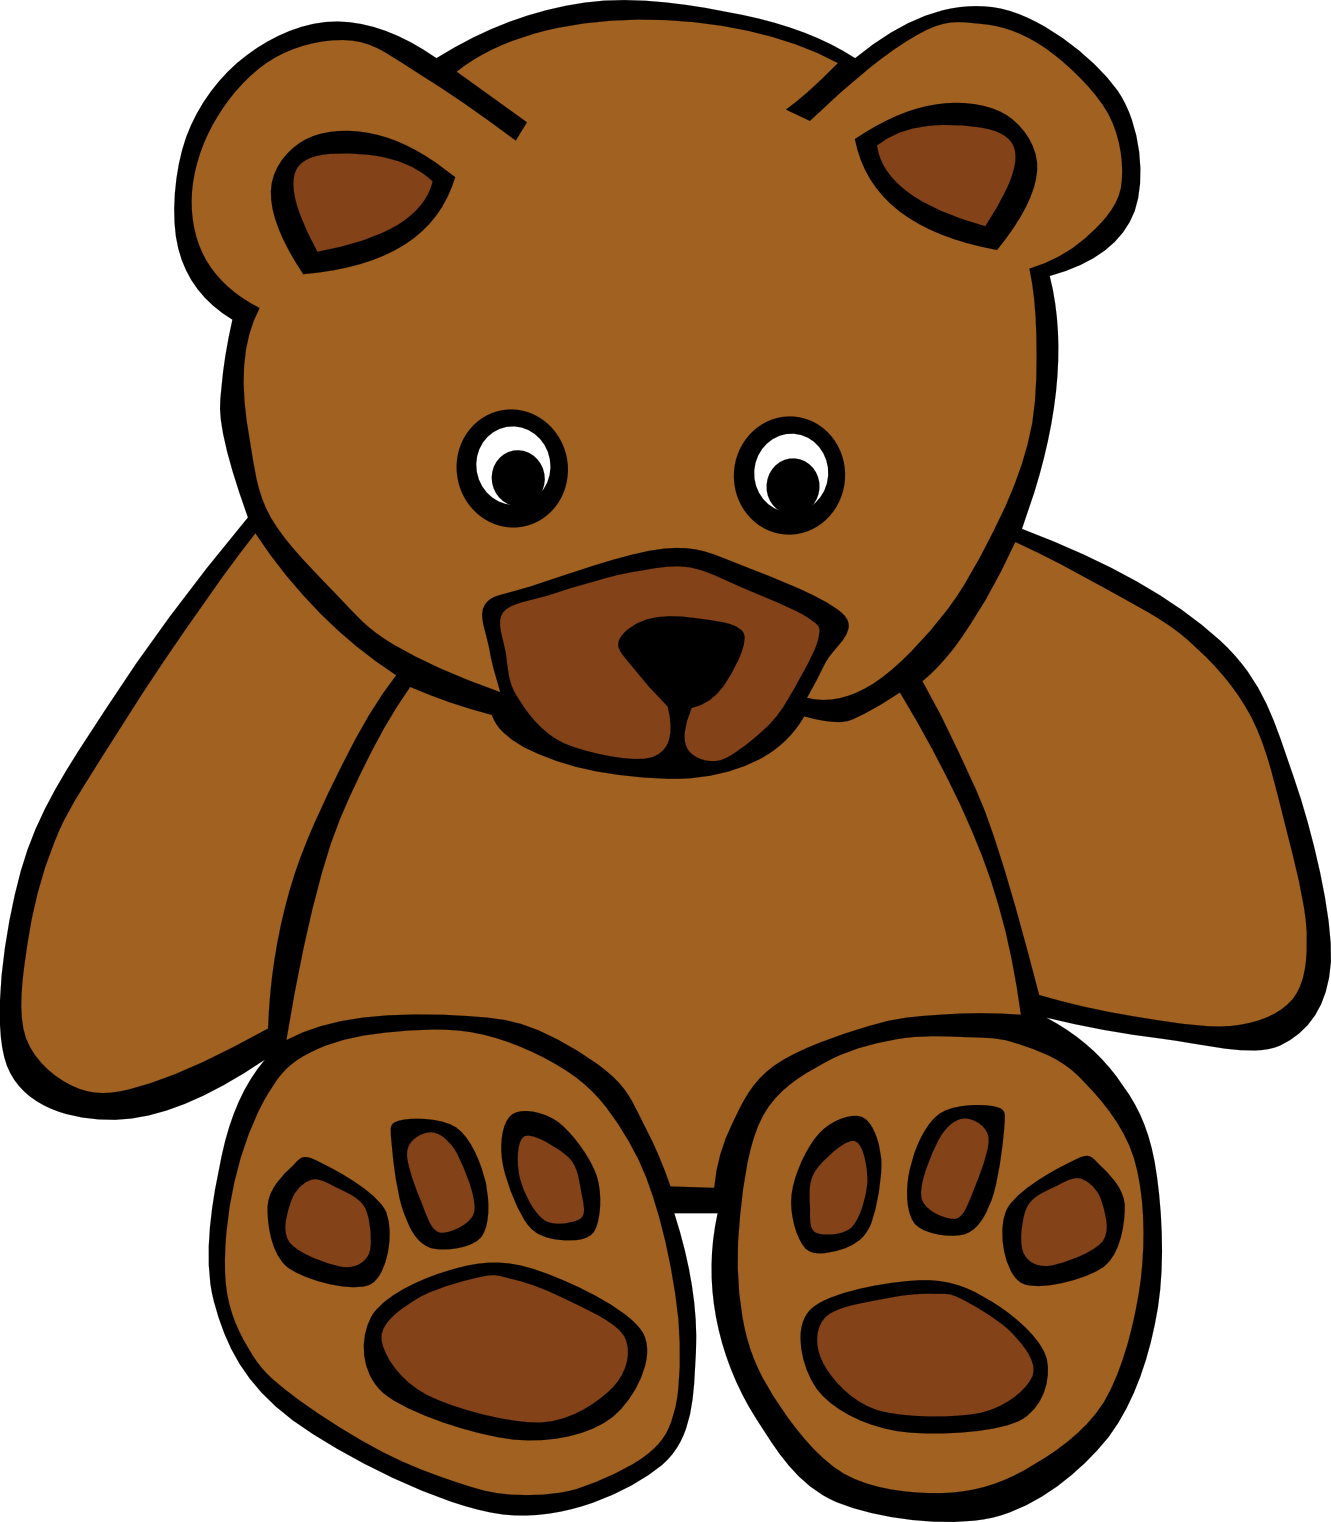 Stuffed Animal Clipart #1